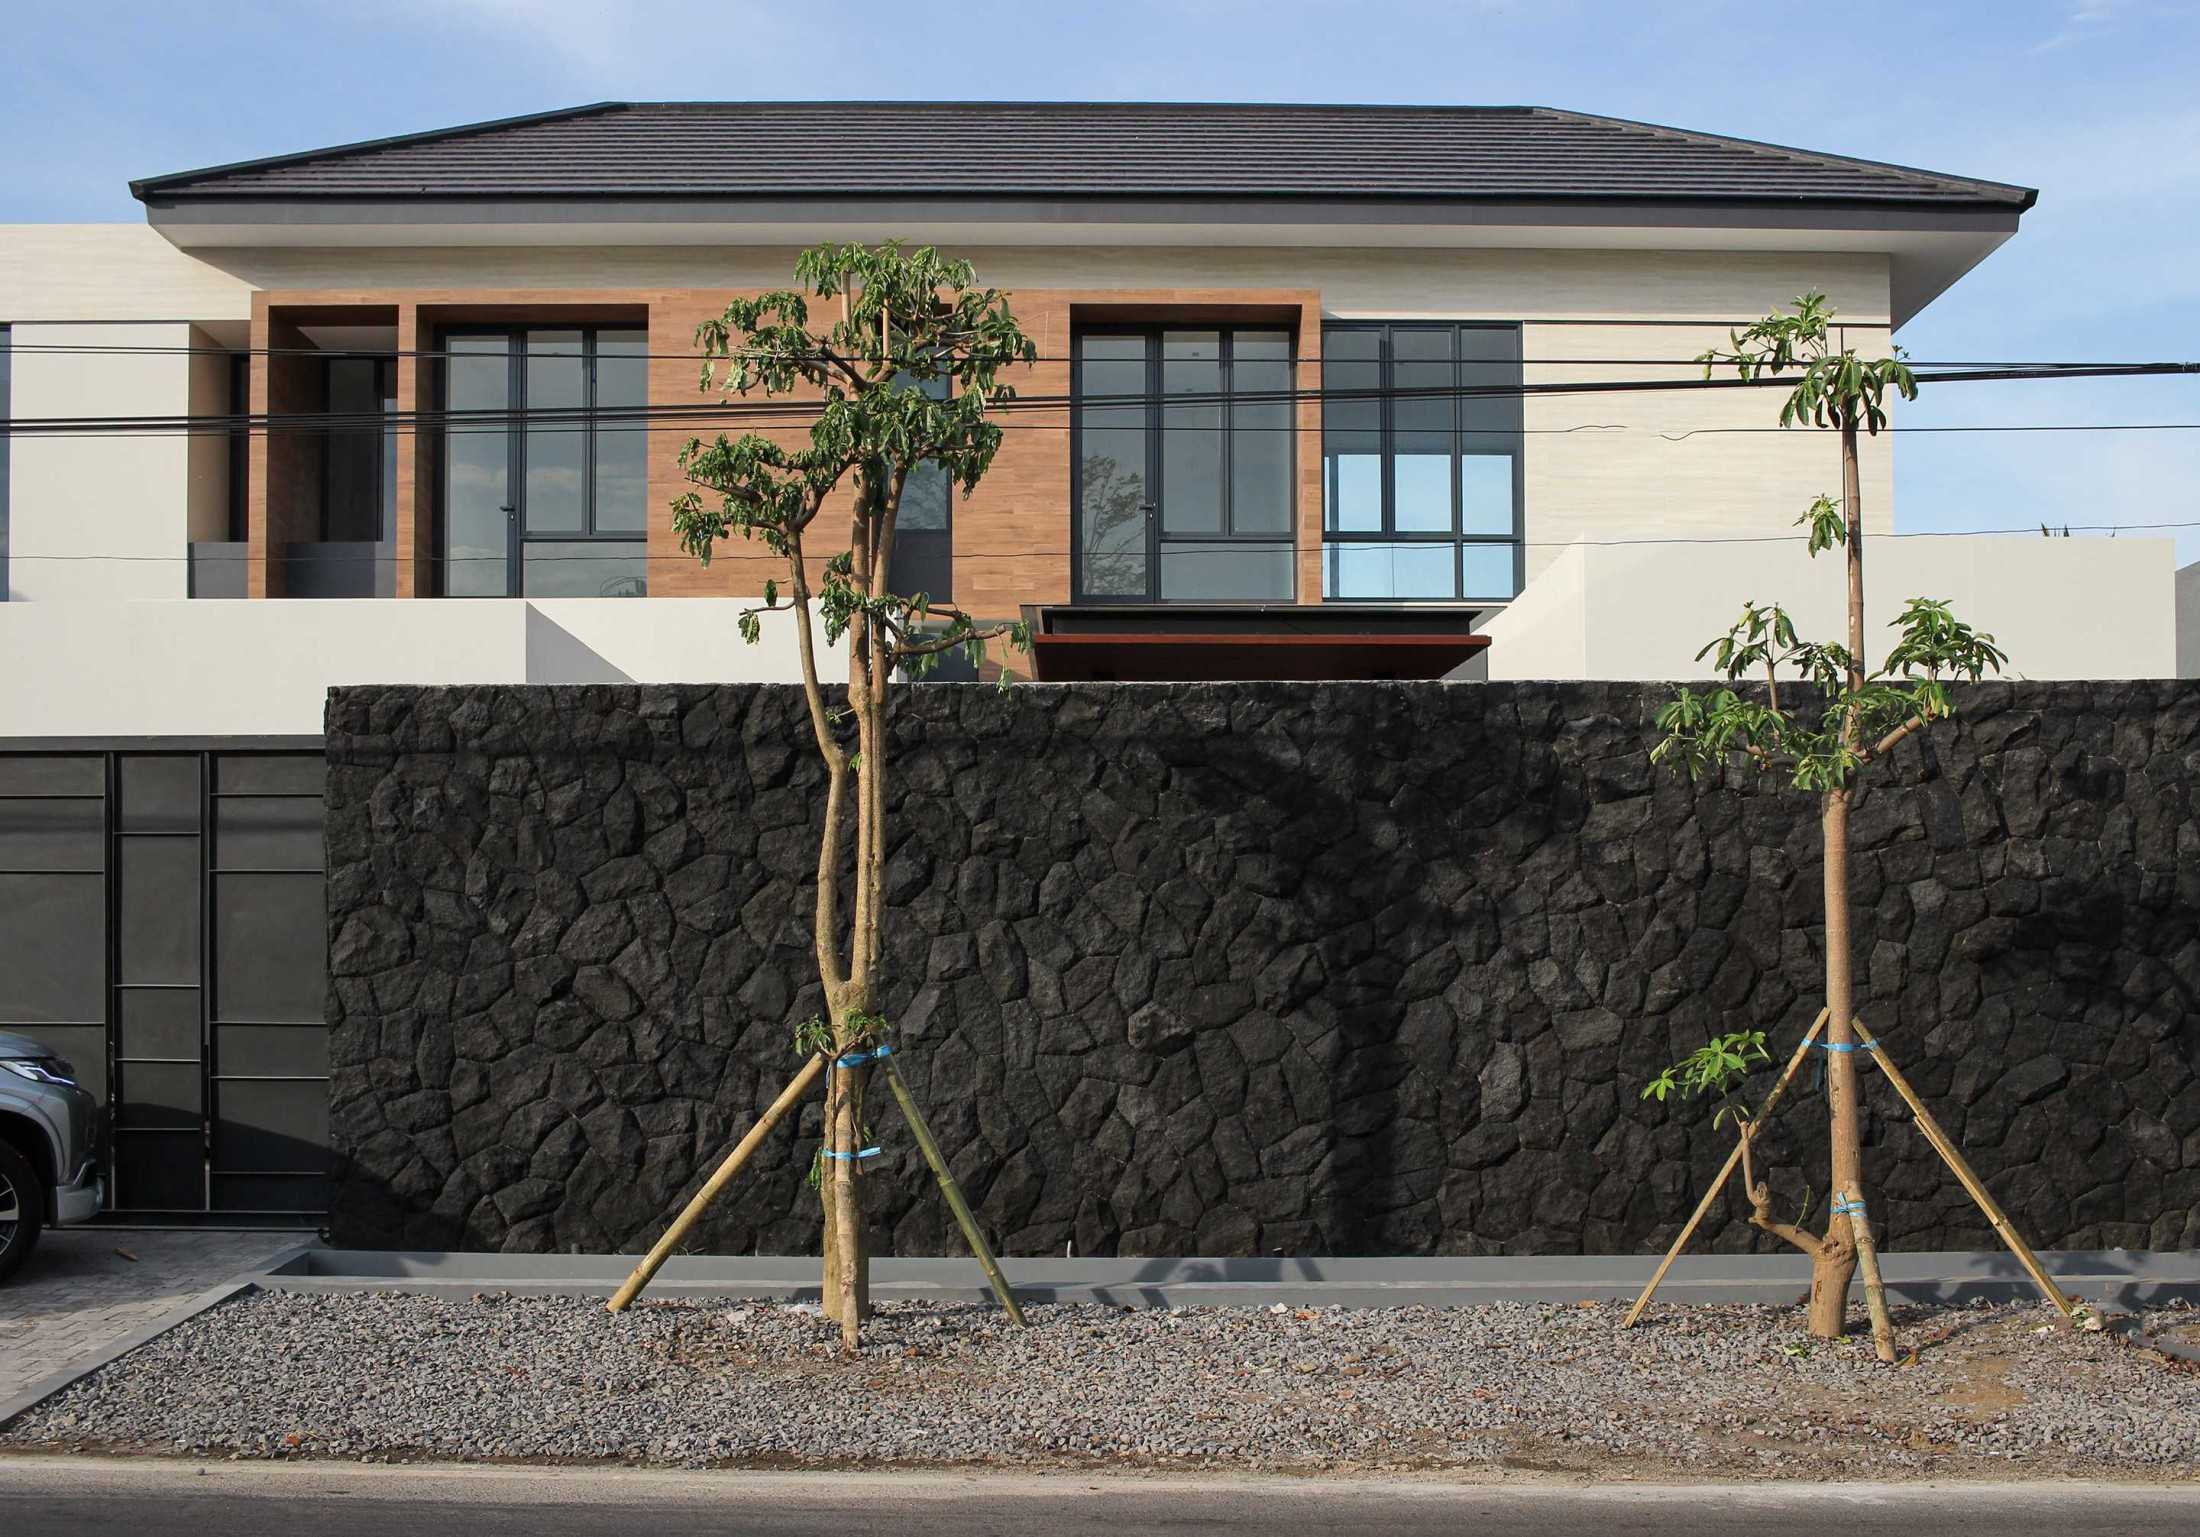 Y0 Design Architect S House Kec. Srono, Kabupaten Banyuwangi, Jawa Timur, Indonesia Kec. Srono, Kabupaten Banyuwangi, Jawa Timur, Indonesia Yohanes-Iswara-Limandjaya-S-House  121076